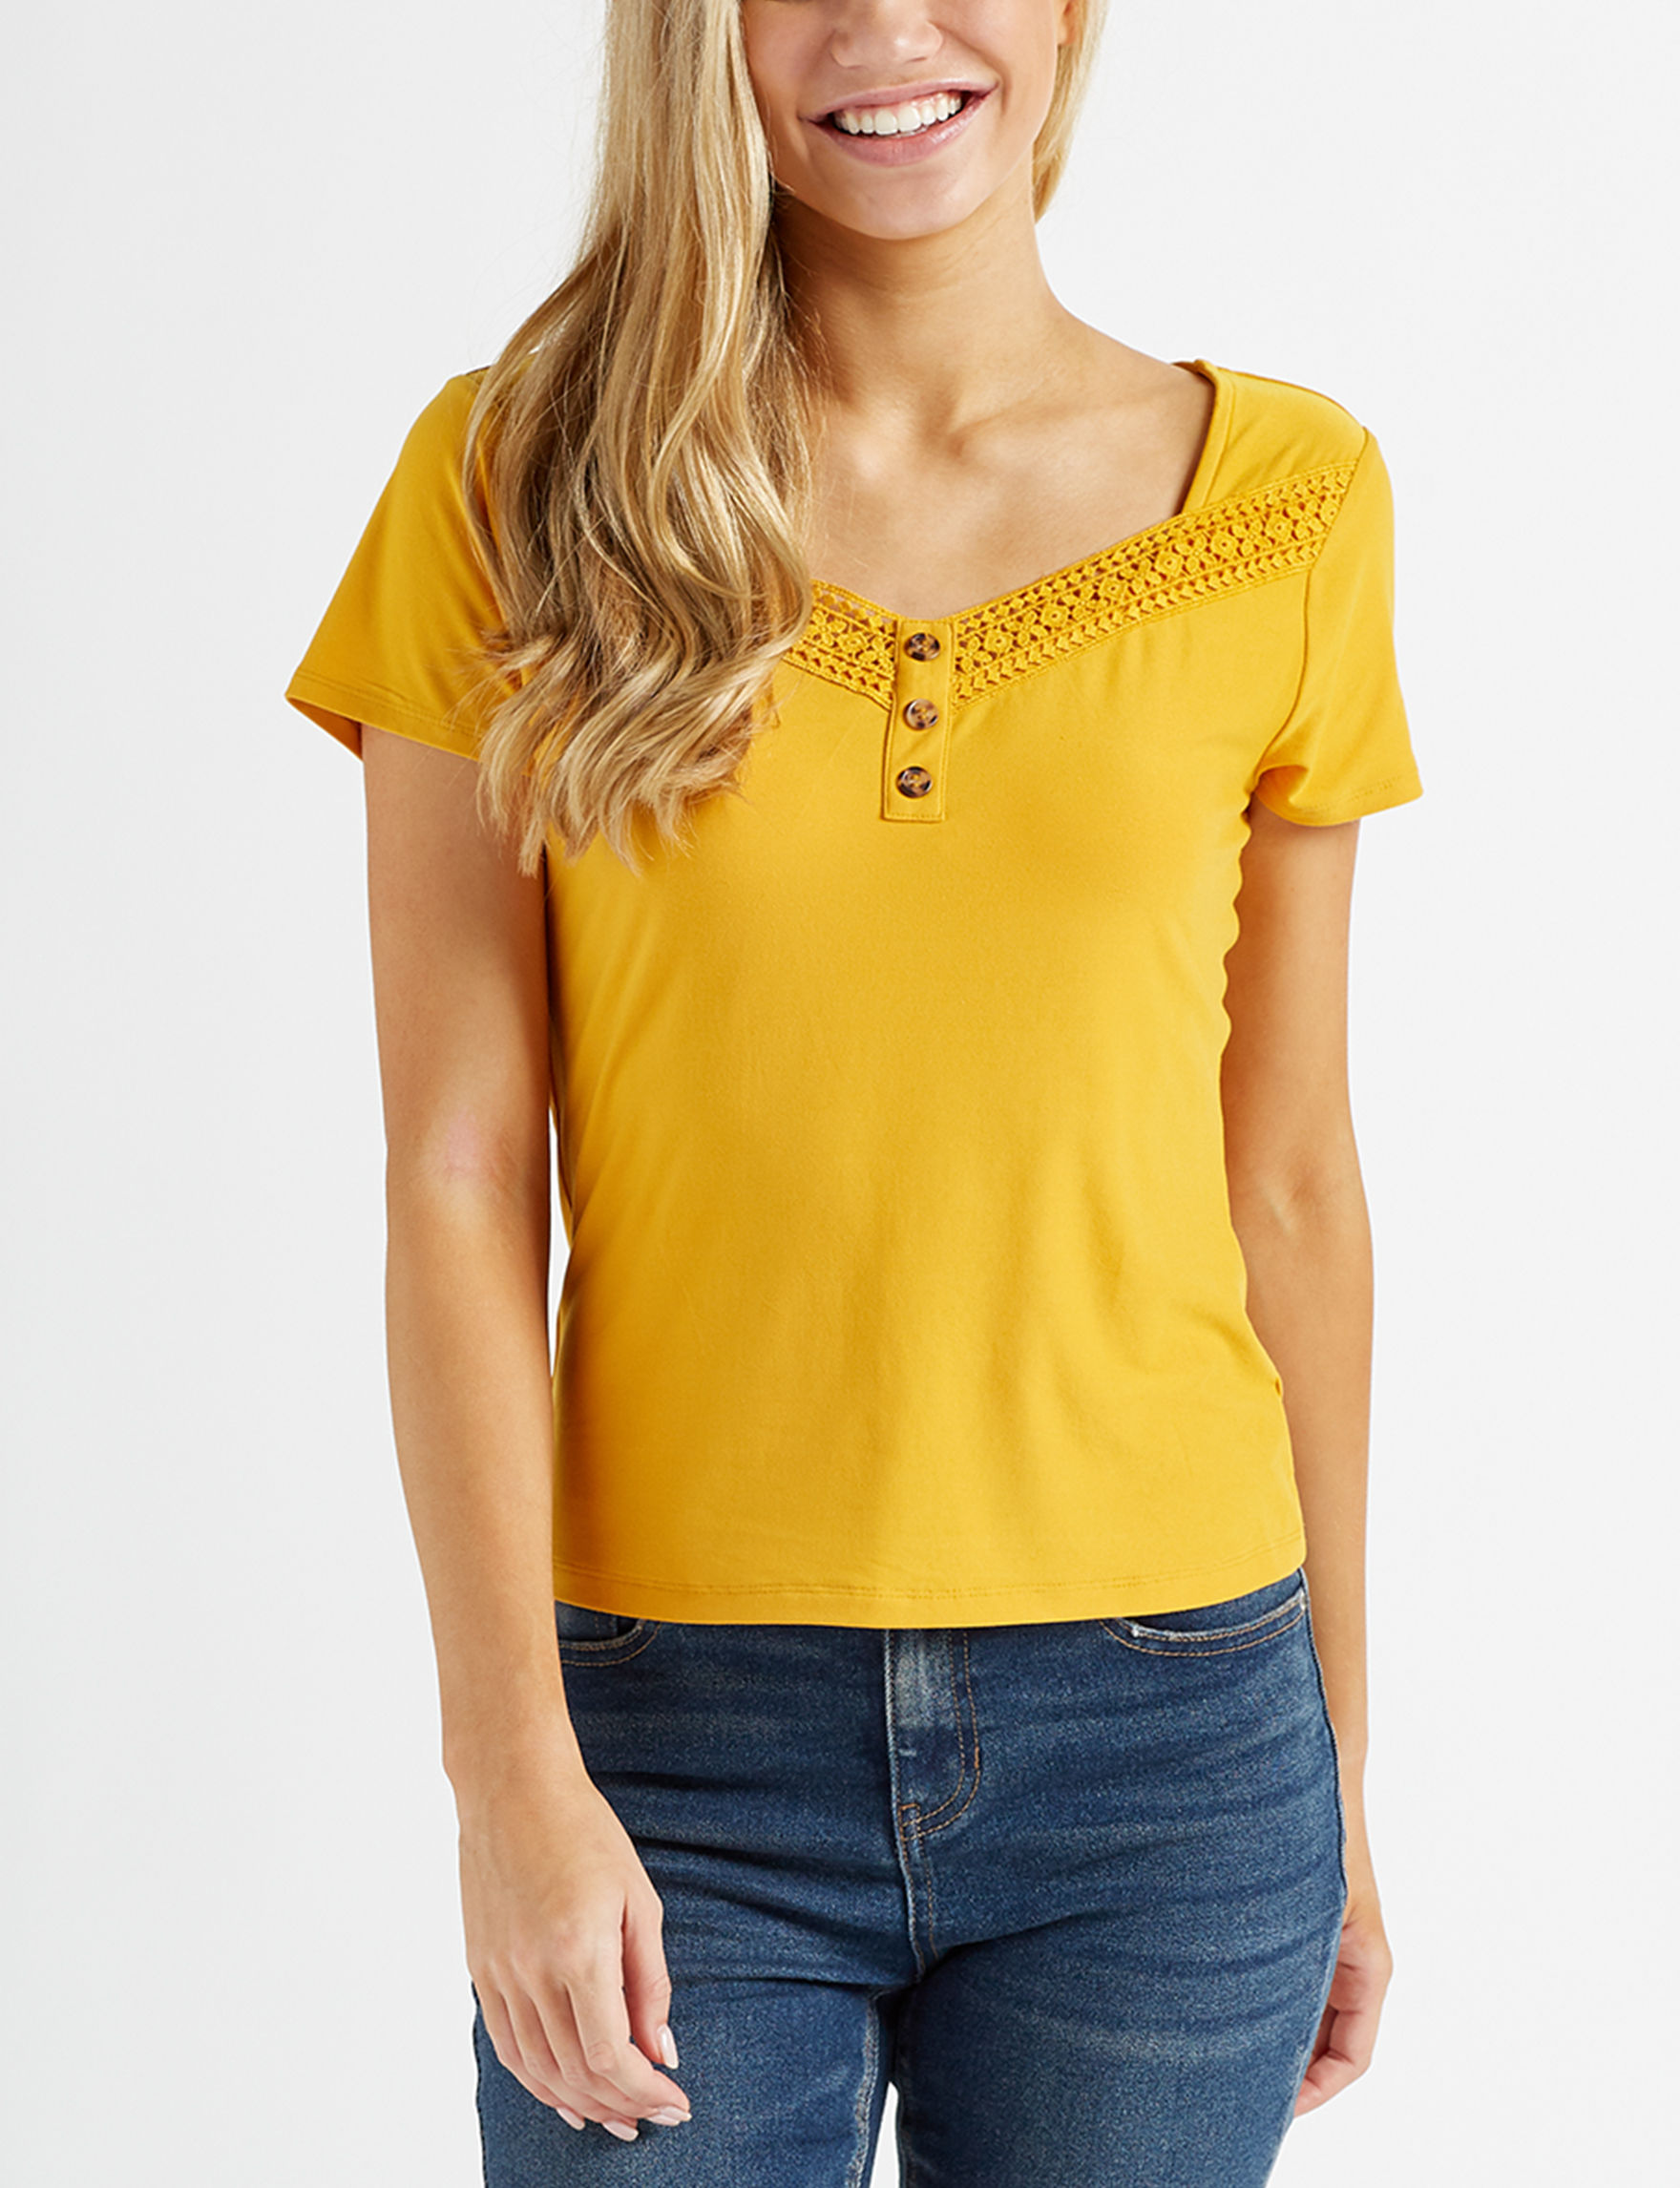 Wishful Park Yellow Shirts & Blouses